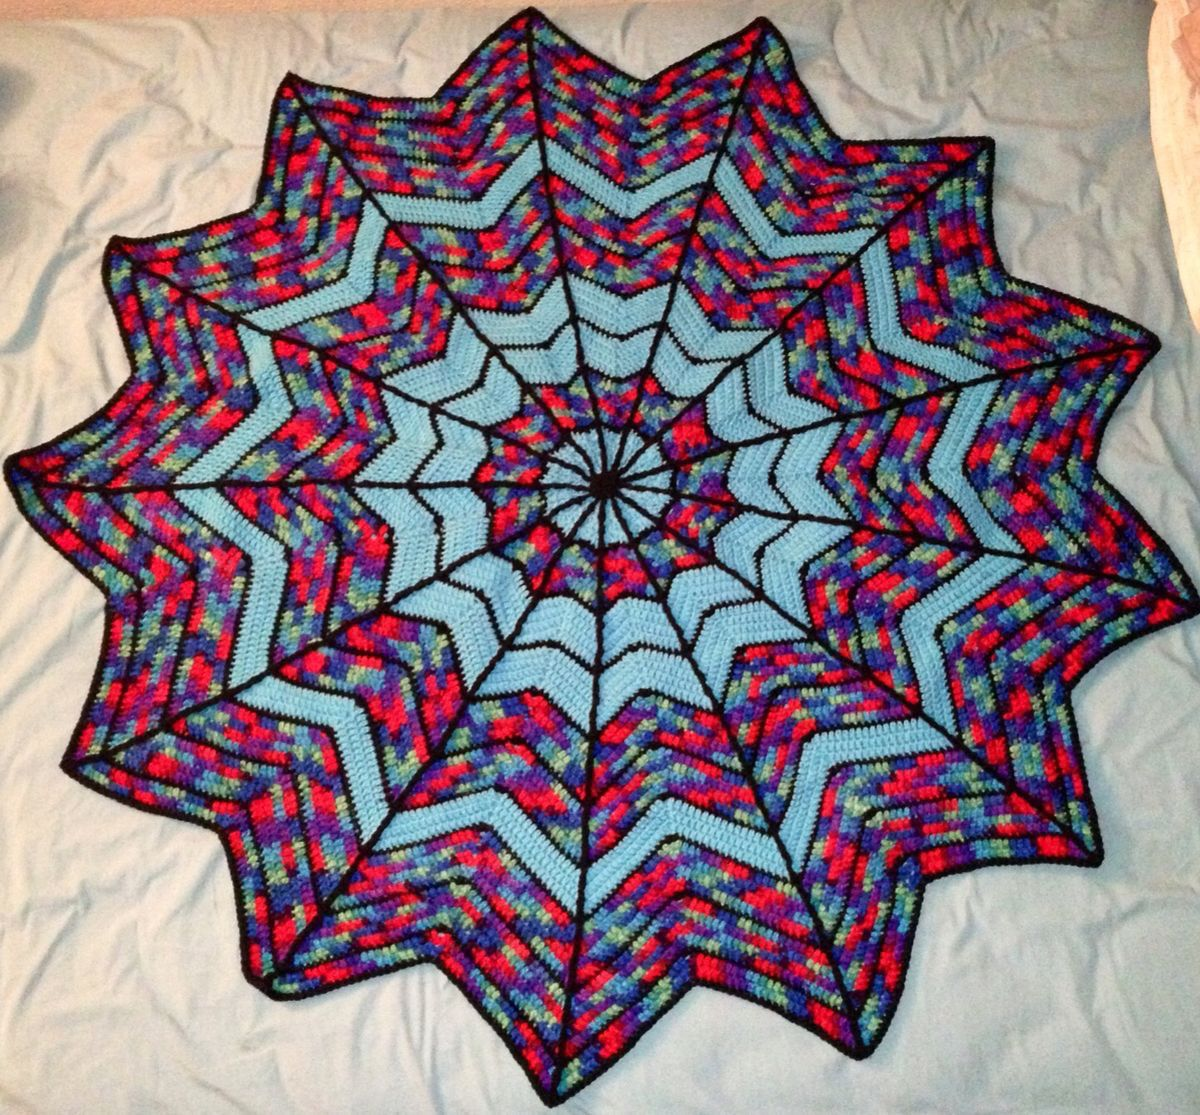 Crocheted Spider-Man web blanket | Spiderman blanket ...